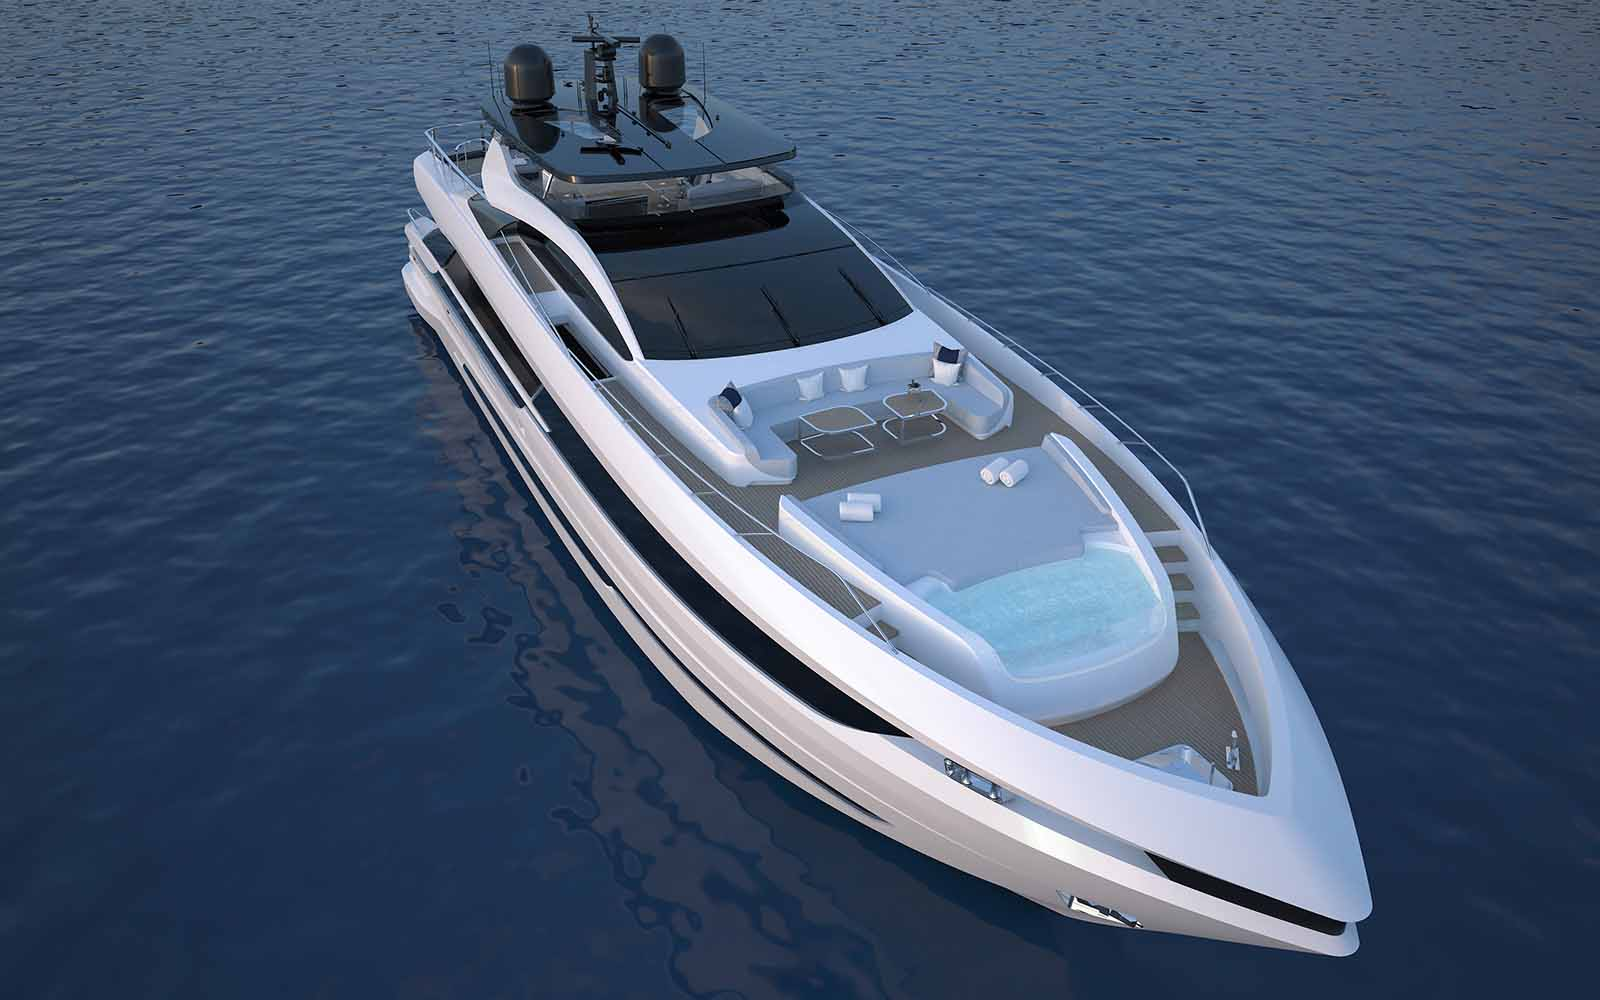 Mangusta apresenta nova GrandSport 30 - boat shopping 3